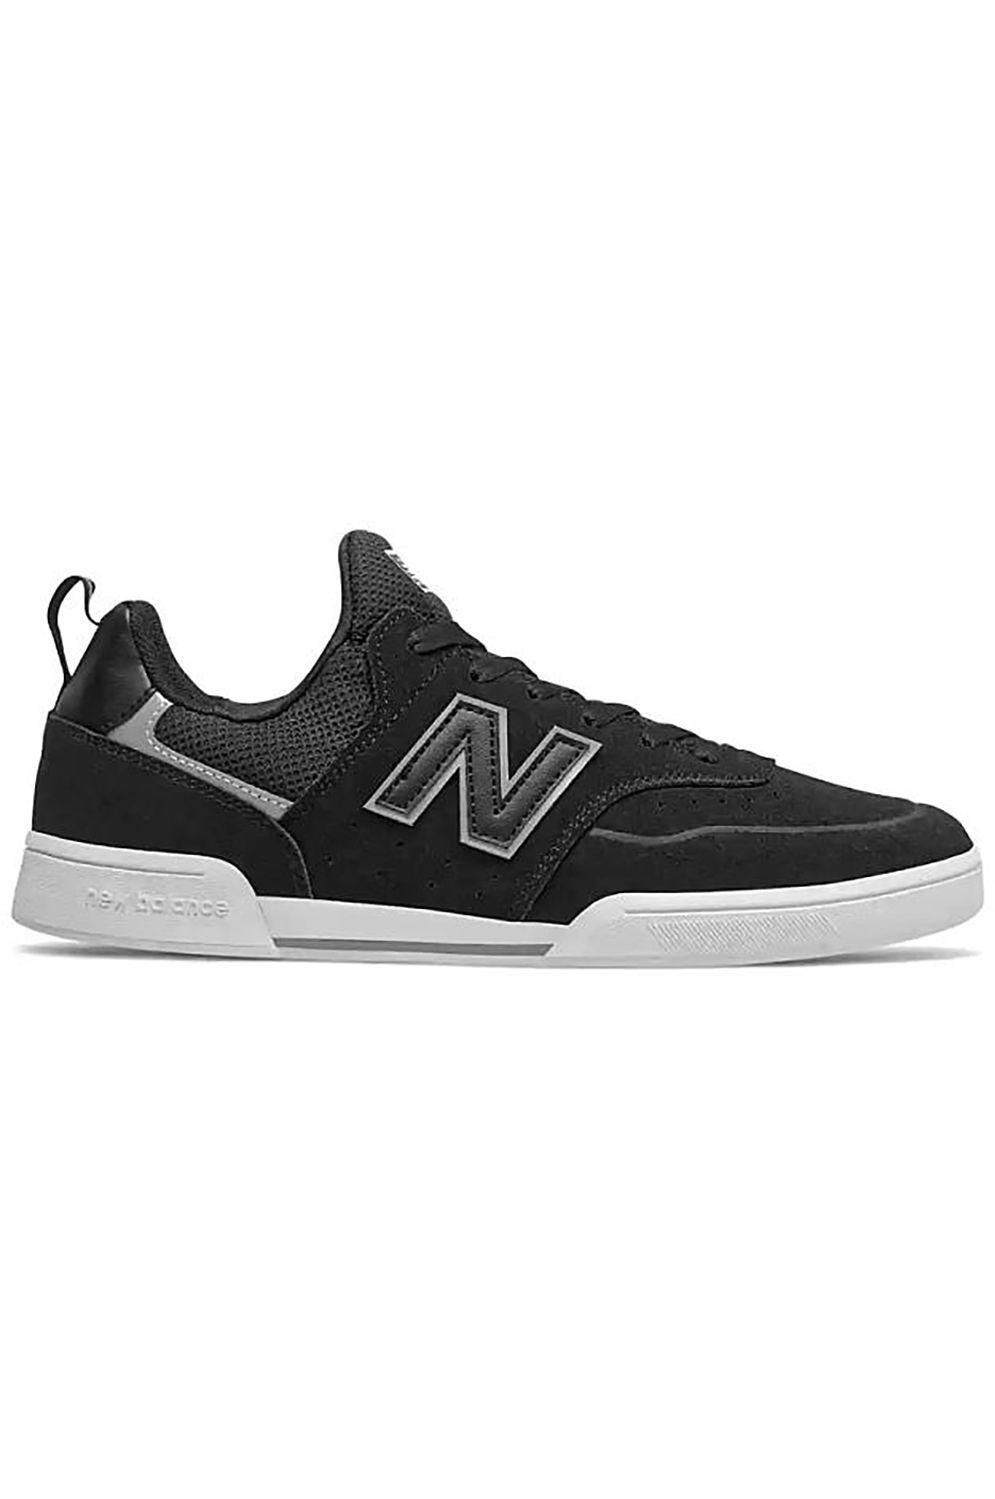 Tenis New Balance NM288S V1 JACK CURTIN Black/White